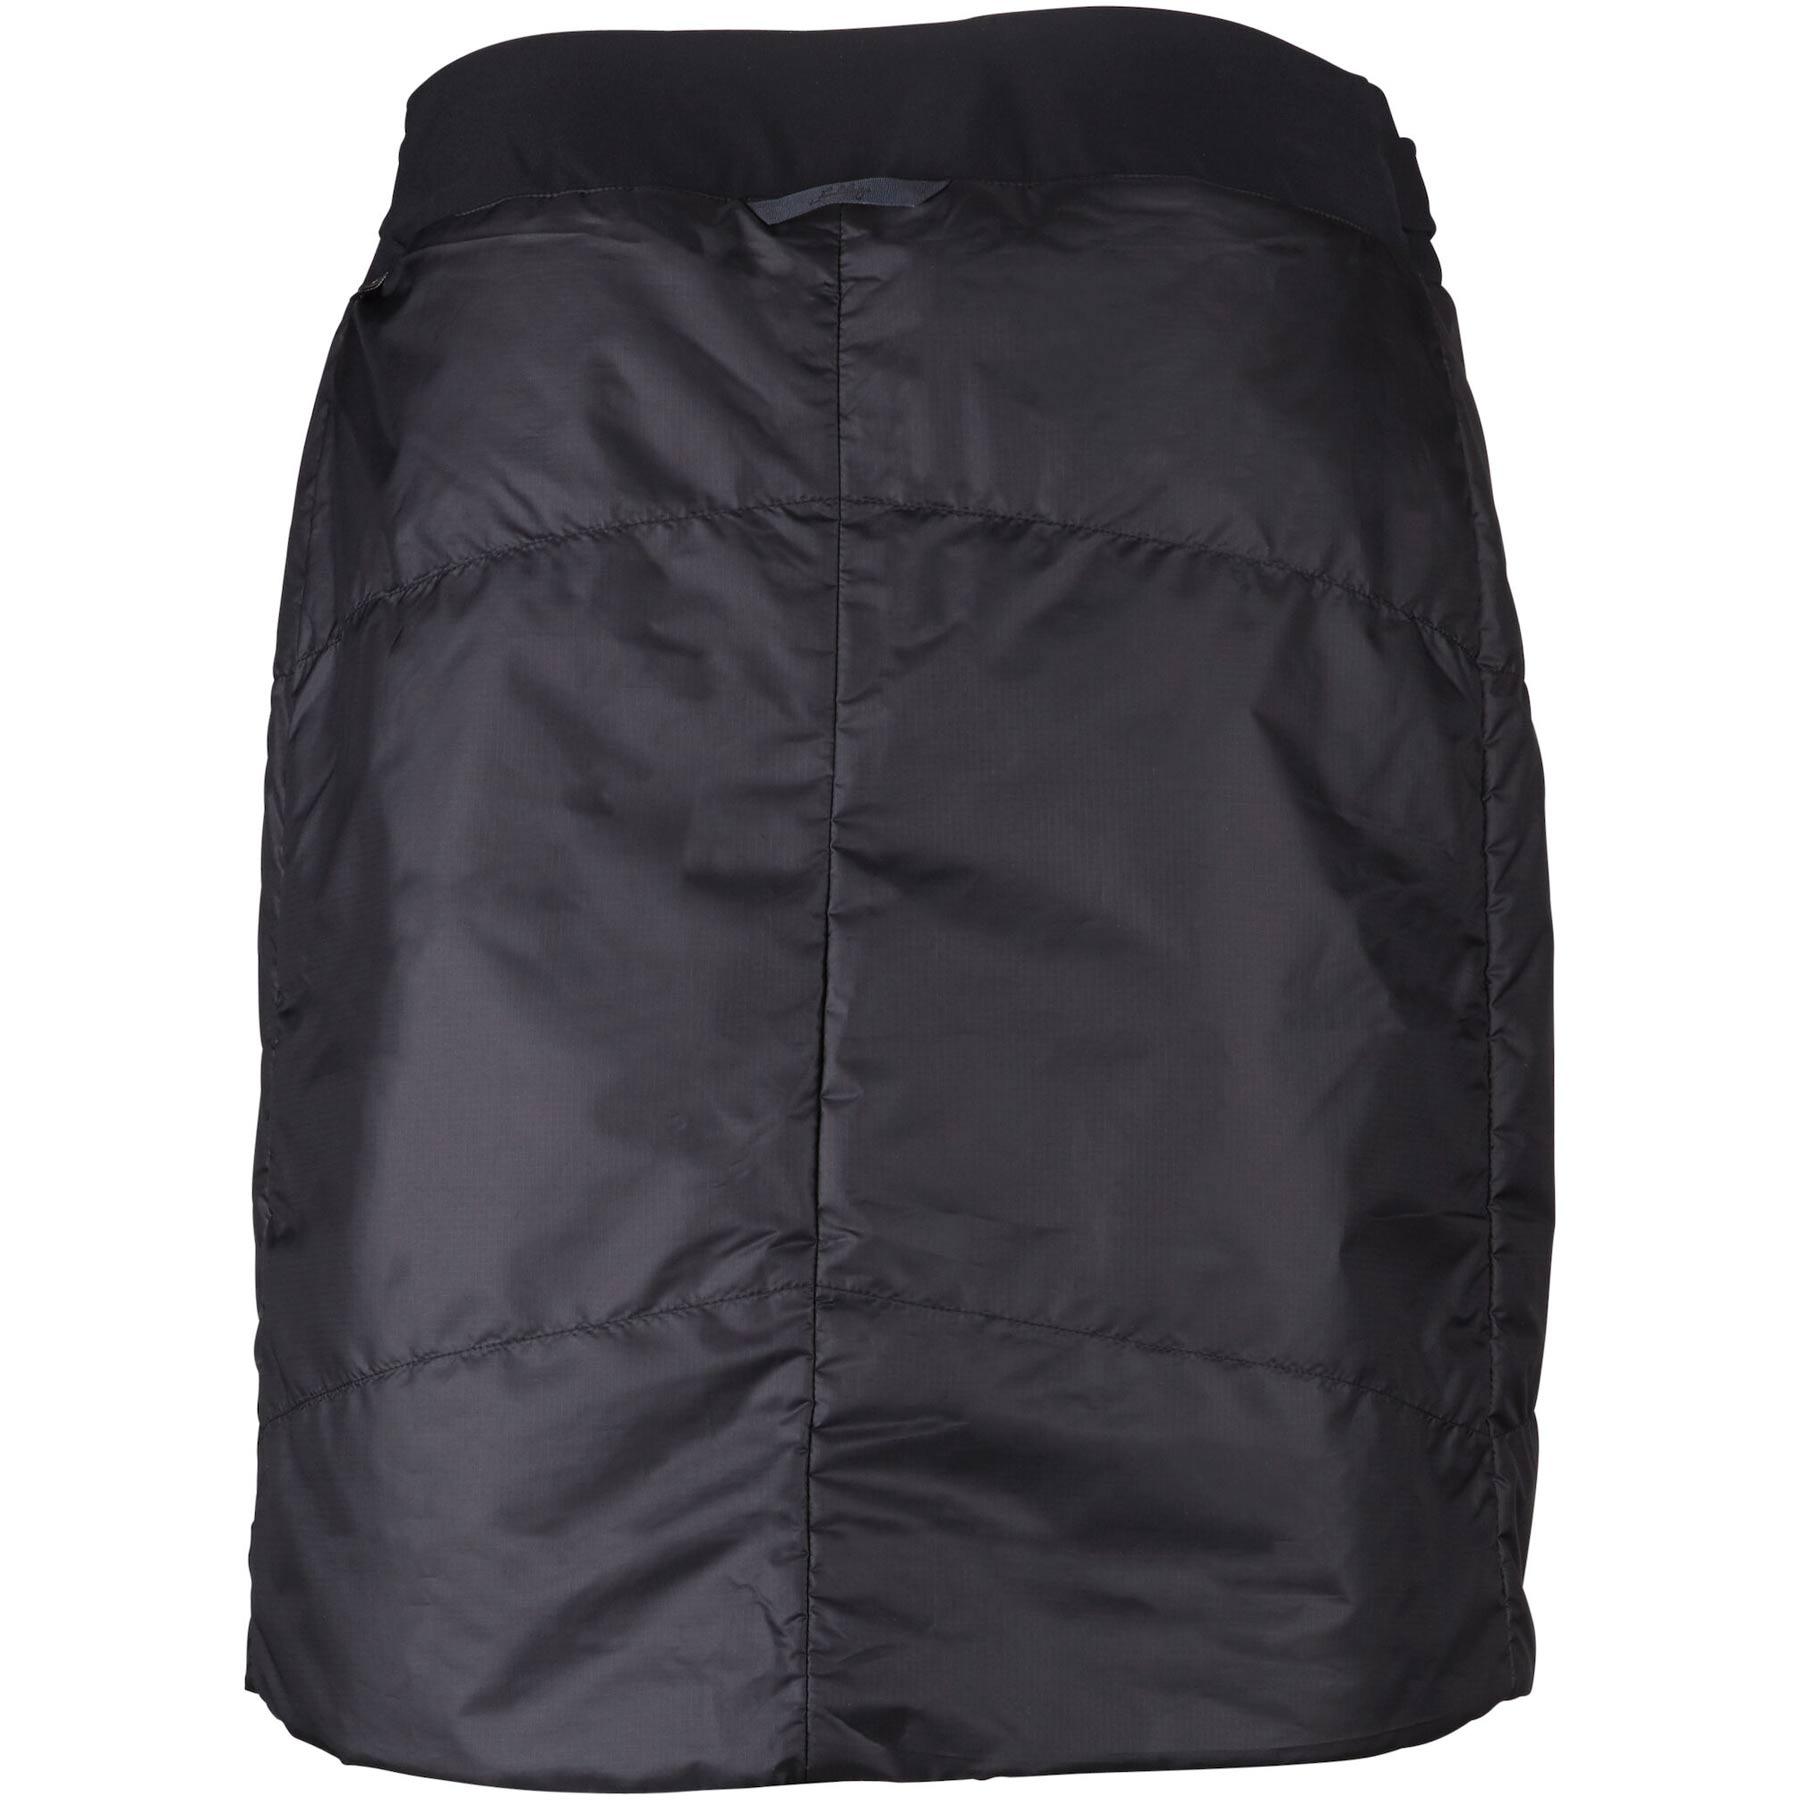 Image of Lundhags Viik Light Women's Insulation Skirt - Black 900